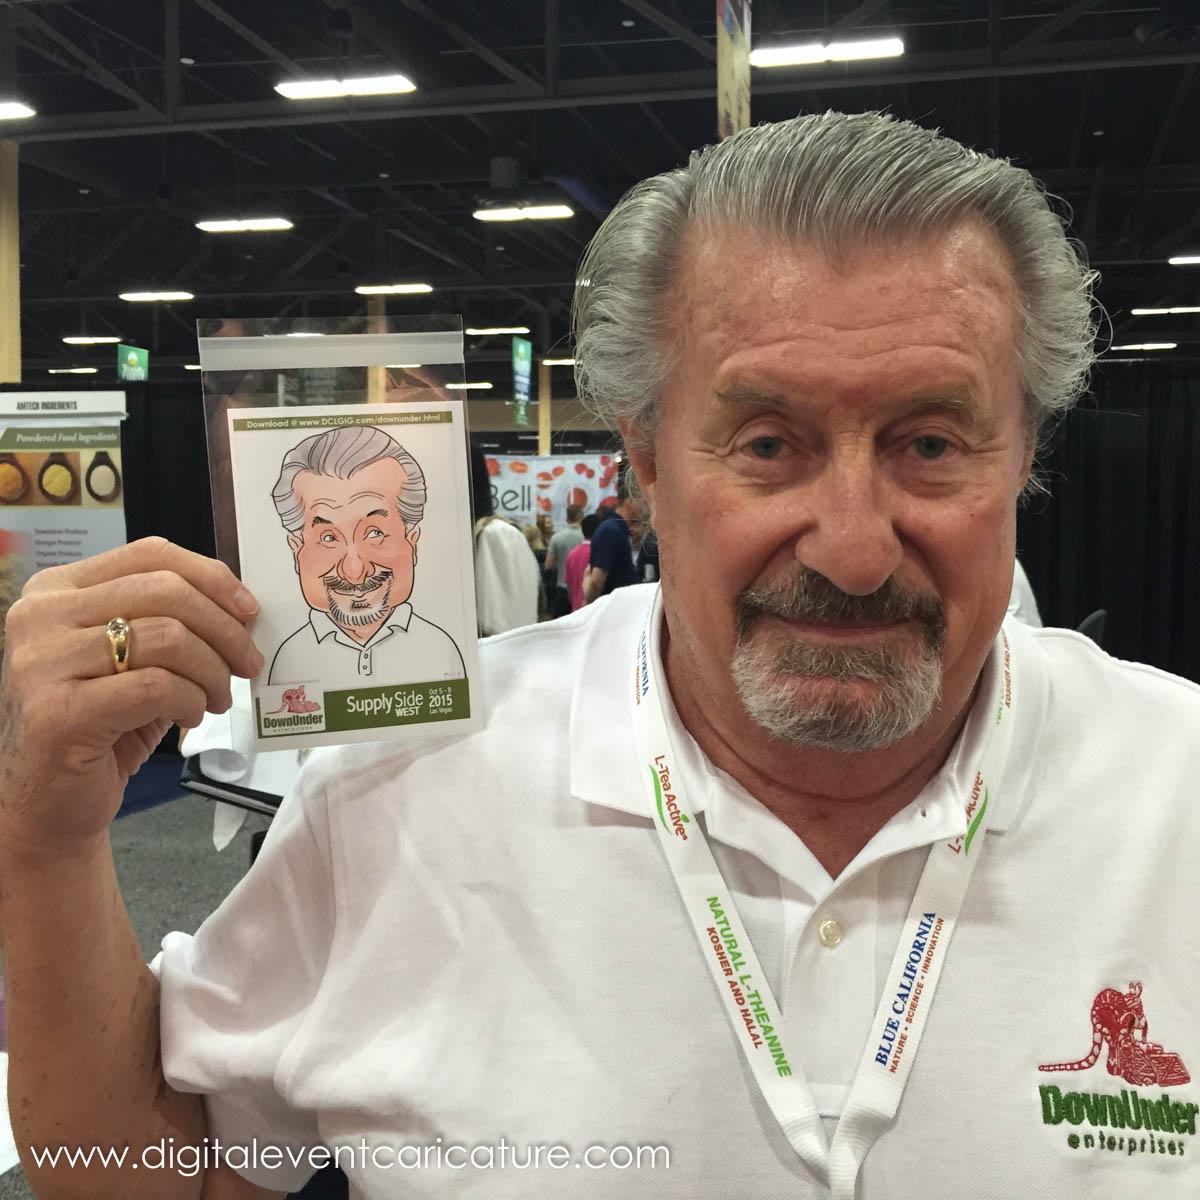 Digital Event Caricature News Blog: Supply Side West, Las Vegas!